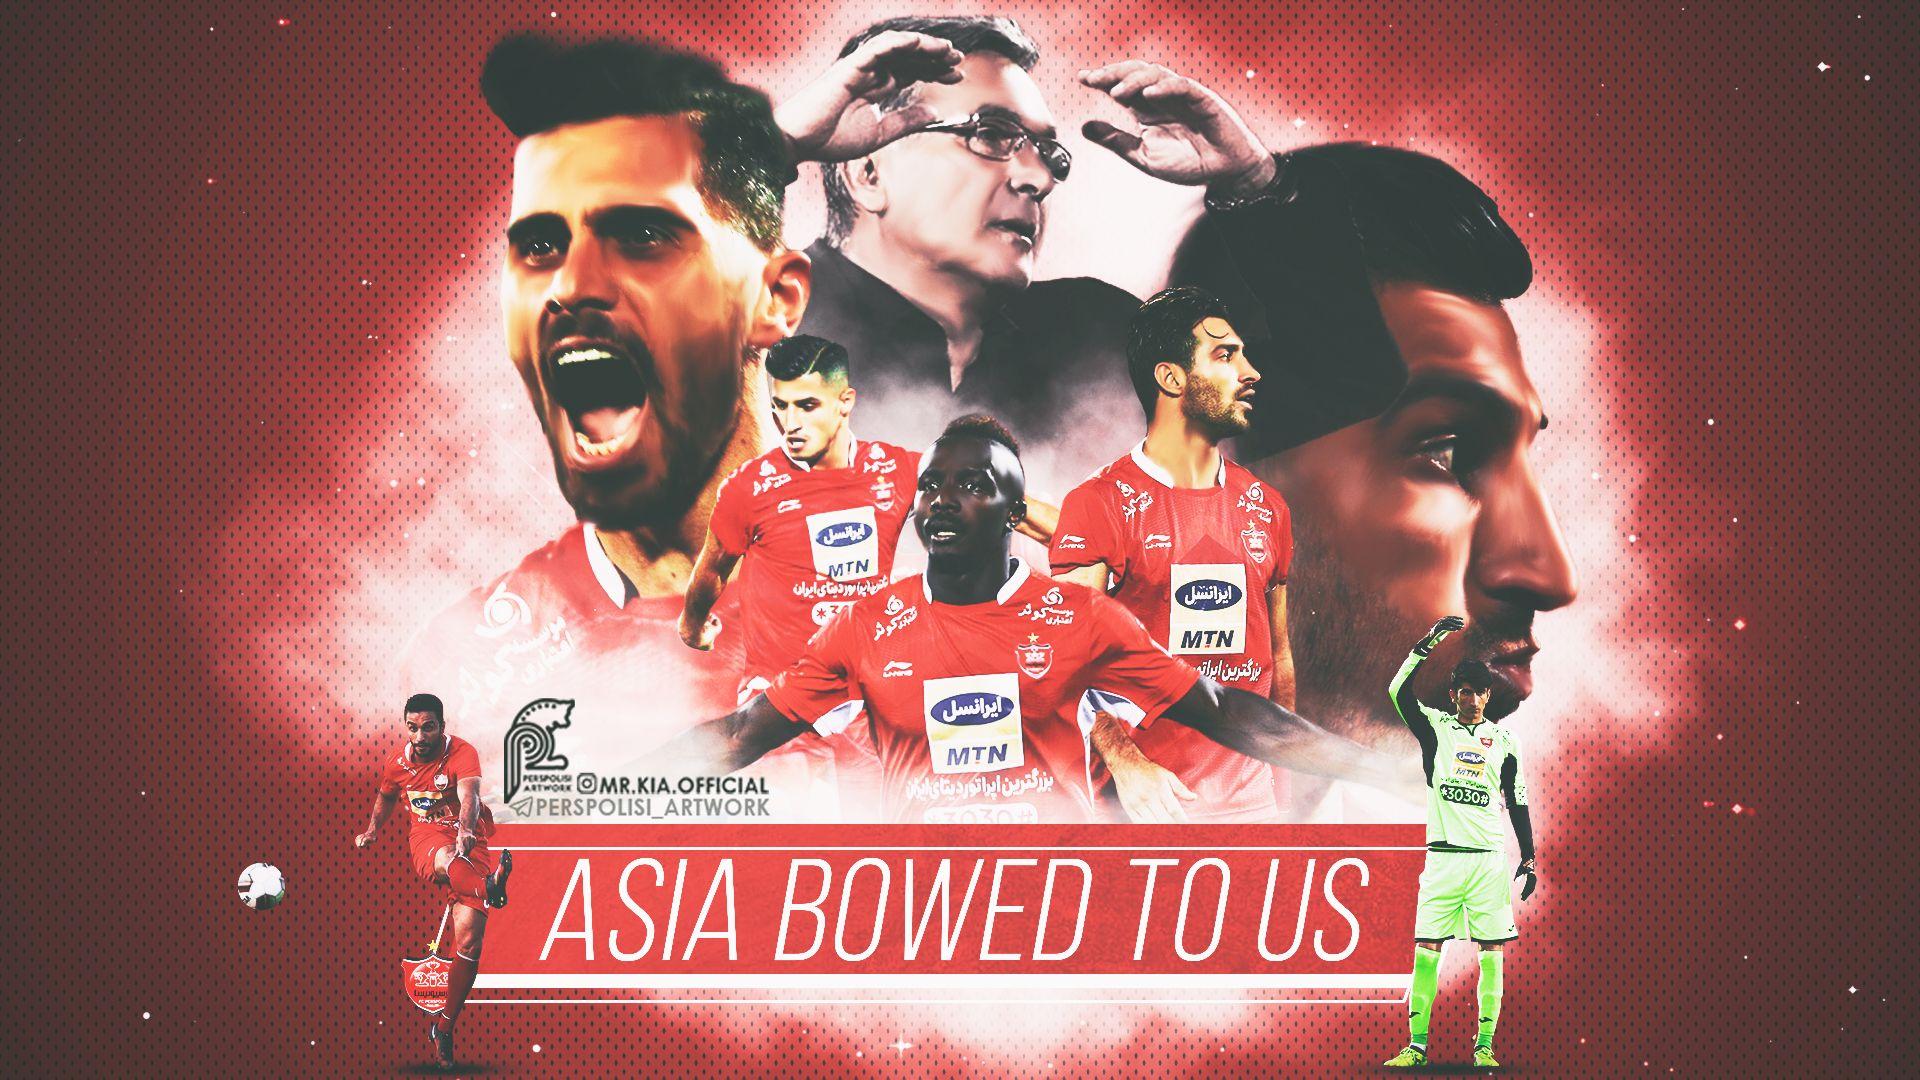 Persepolis Perspolis Team Iran Football Team Asia Afcchampionsleague Footydesign Design Footballedit Footye Photo And Video Photo Instagram Photo